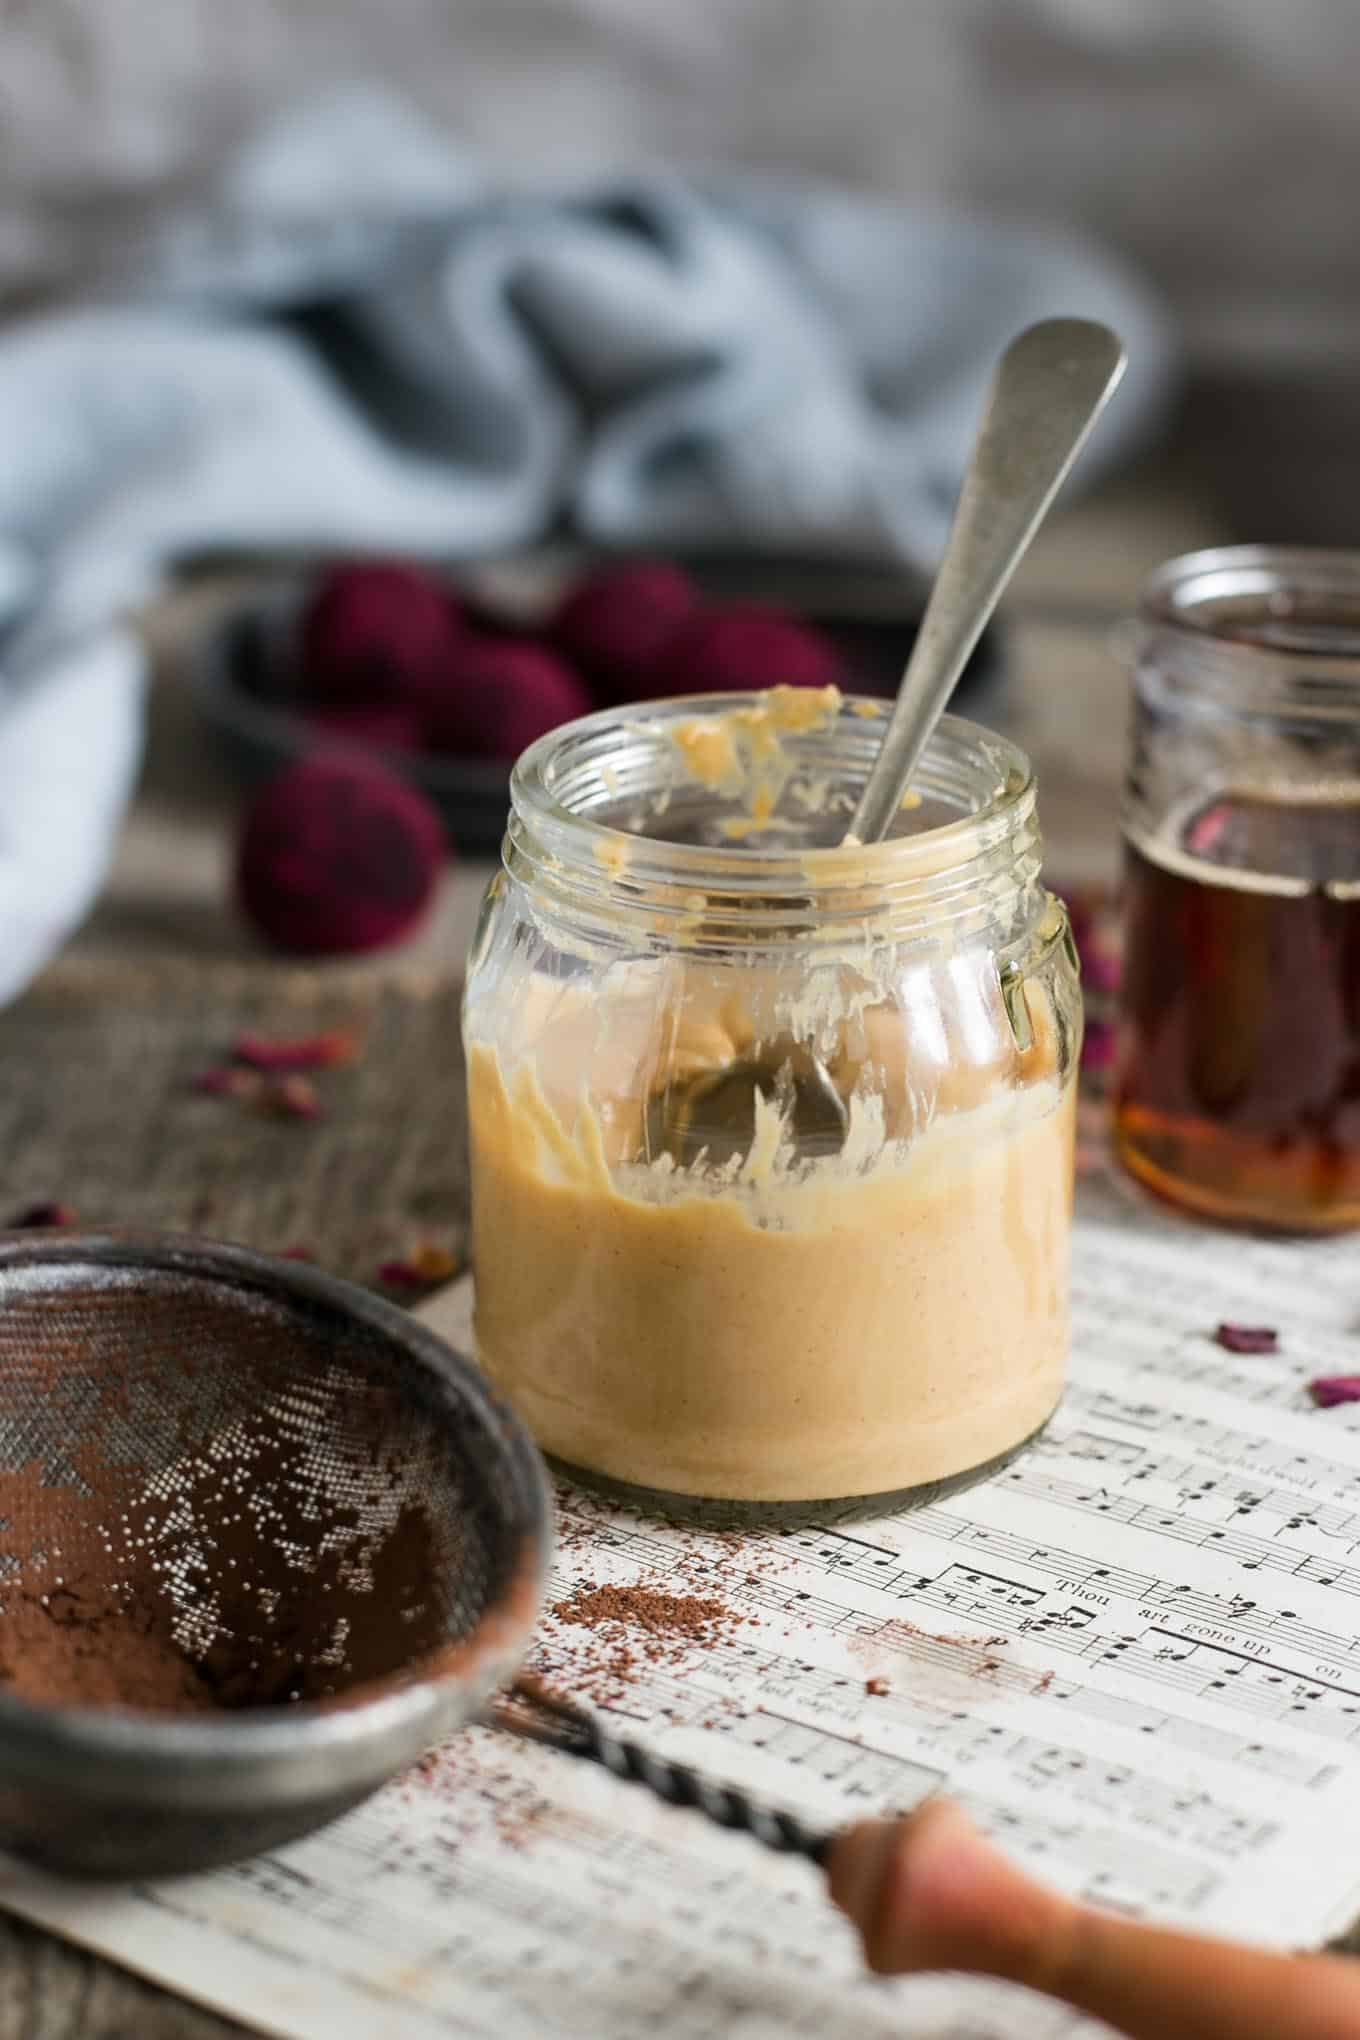 Chocolate and peanut butter truffles recipe #vegan #healthysnack #truffles   via @annabanana.co